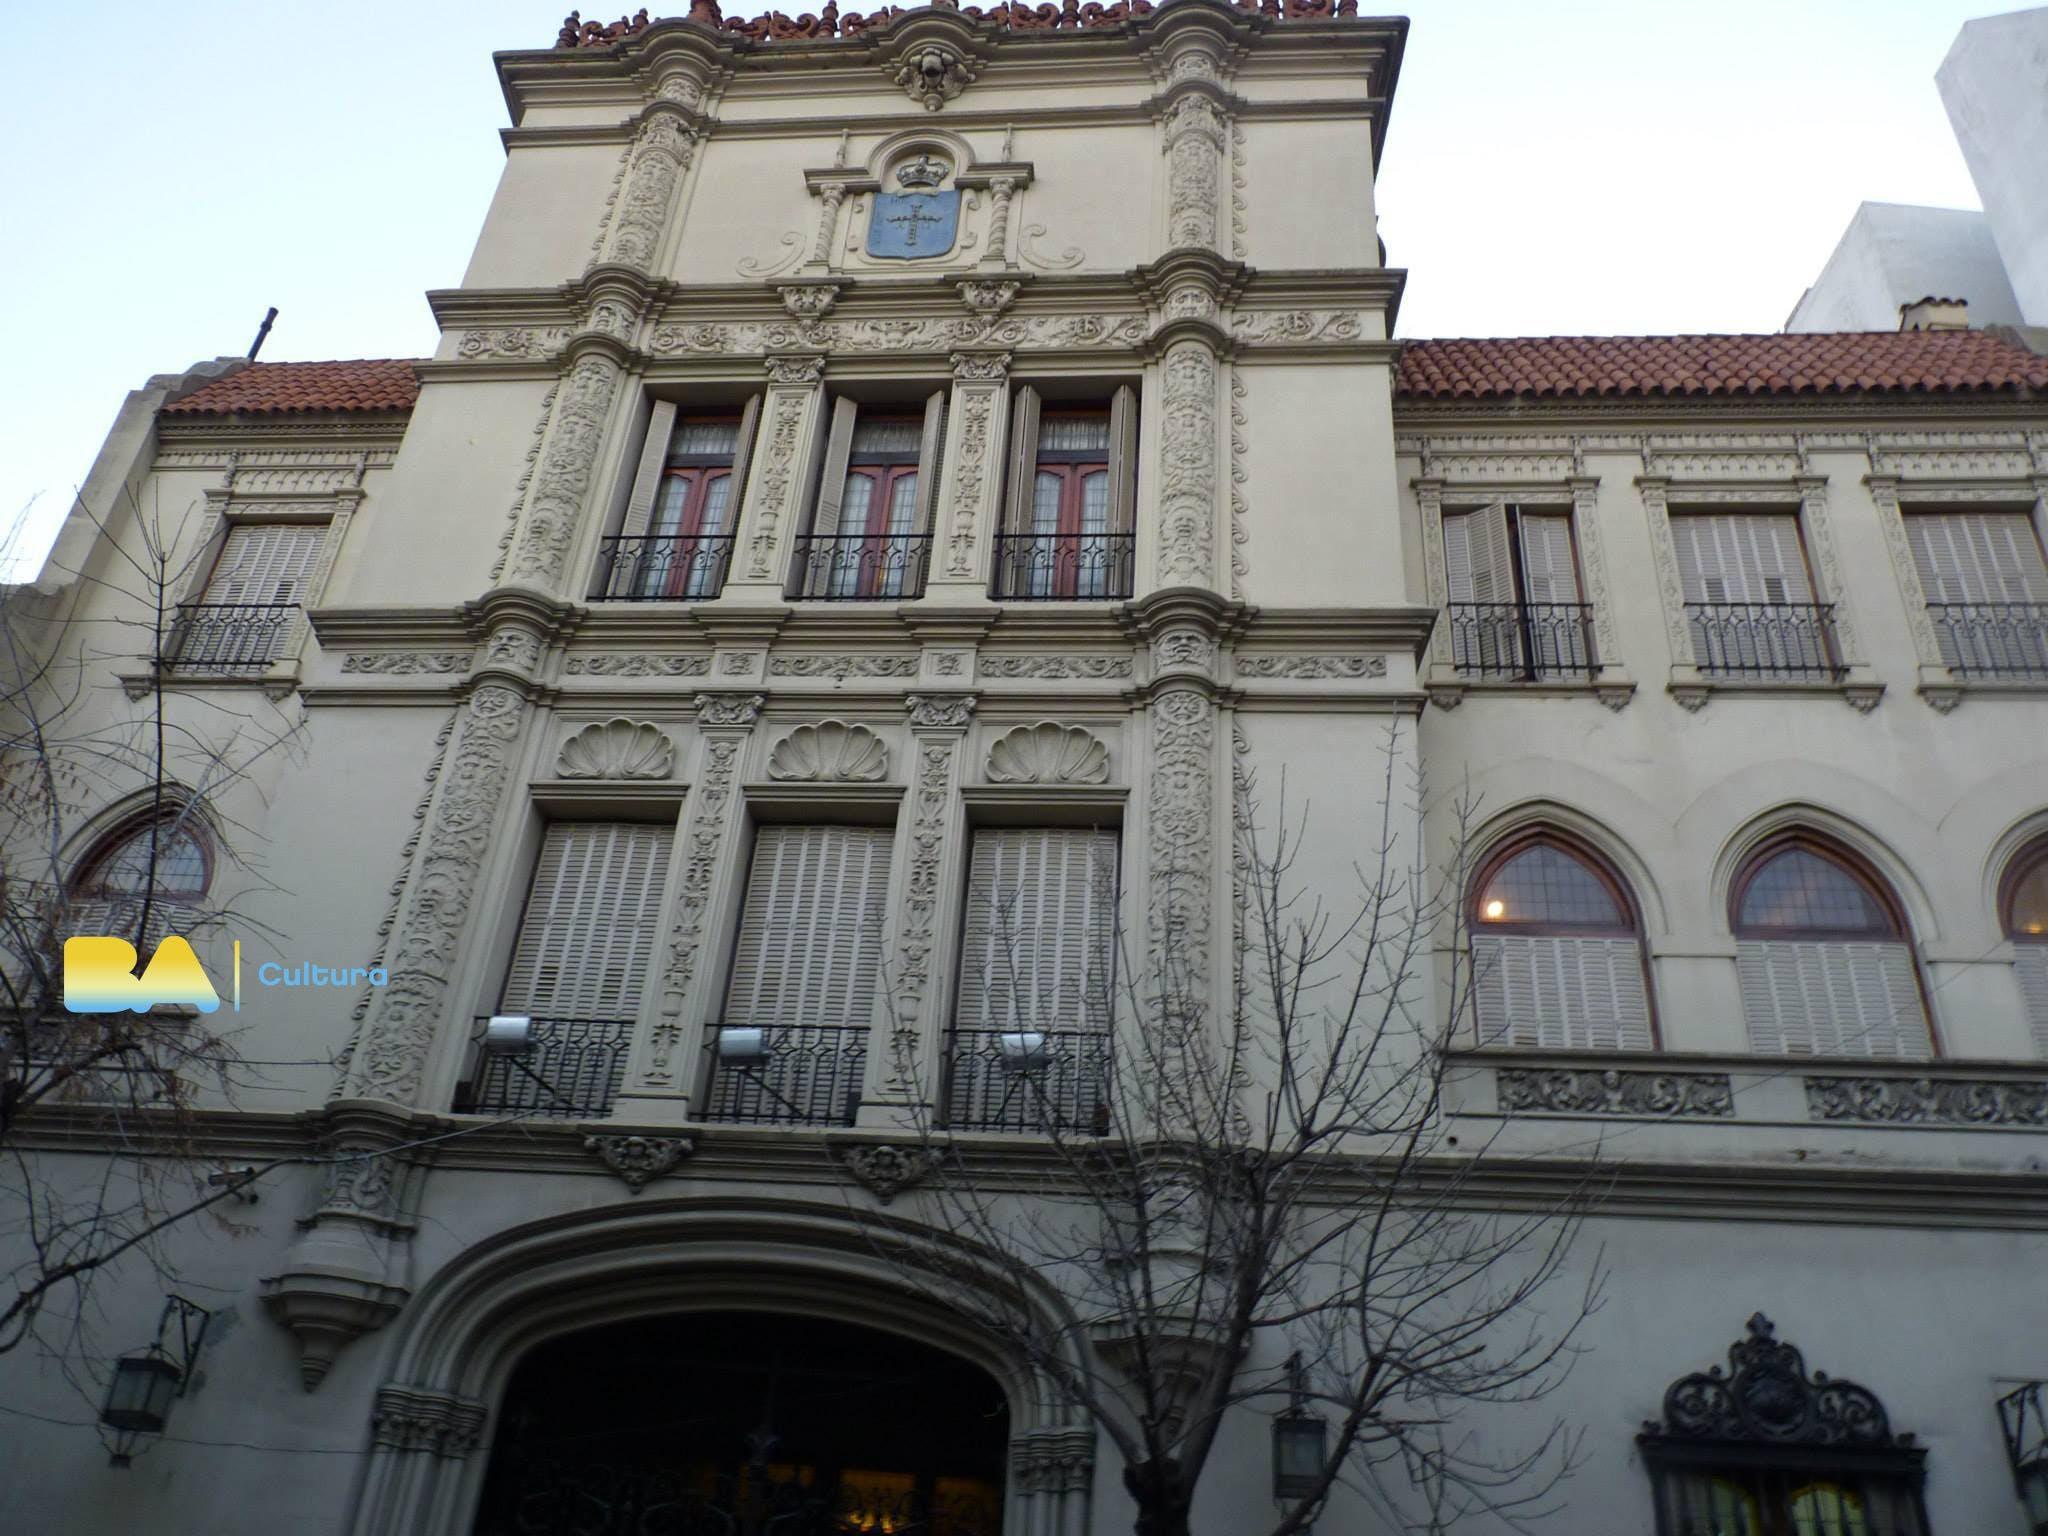 Colectividades en el Casco Histórico - Centro